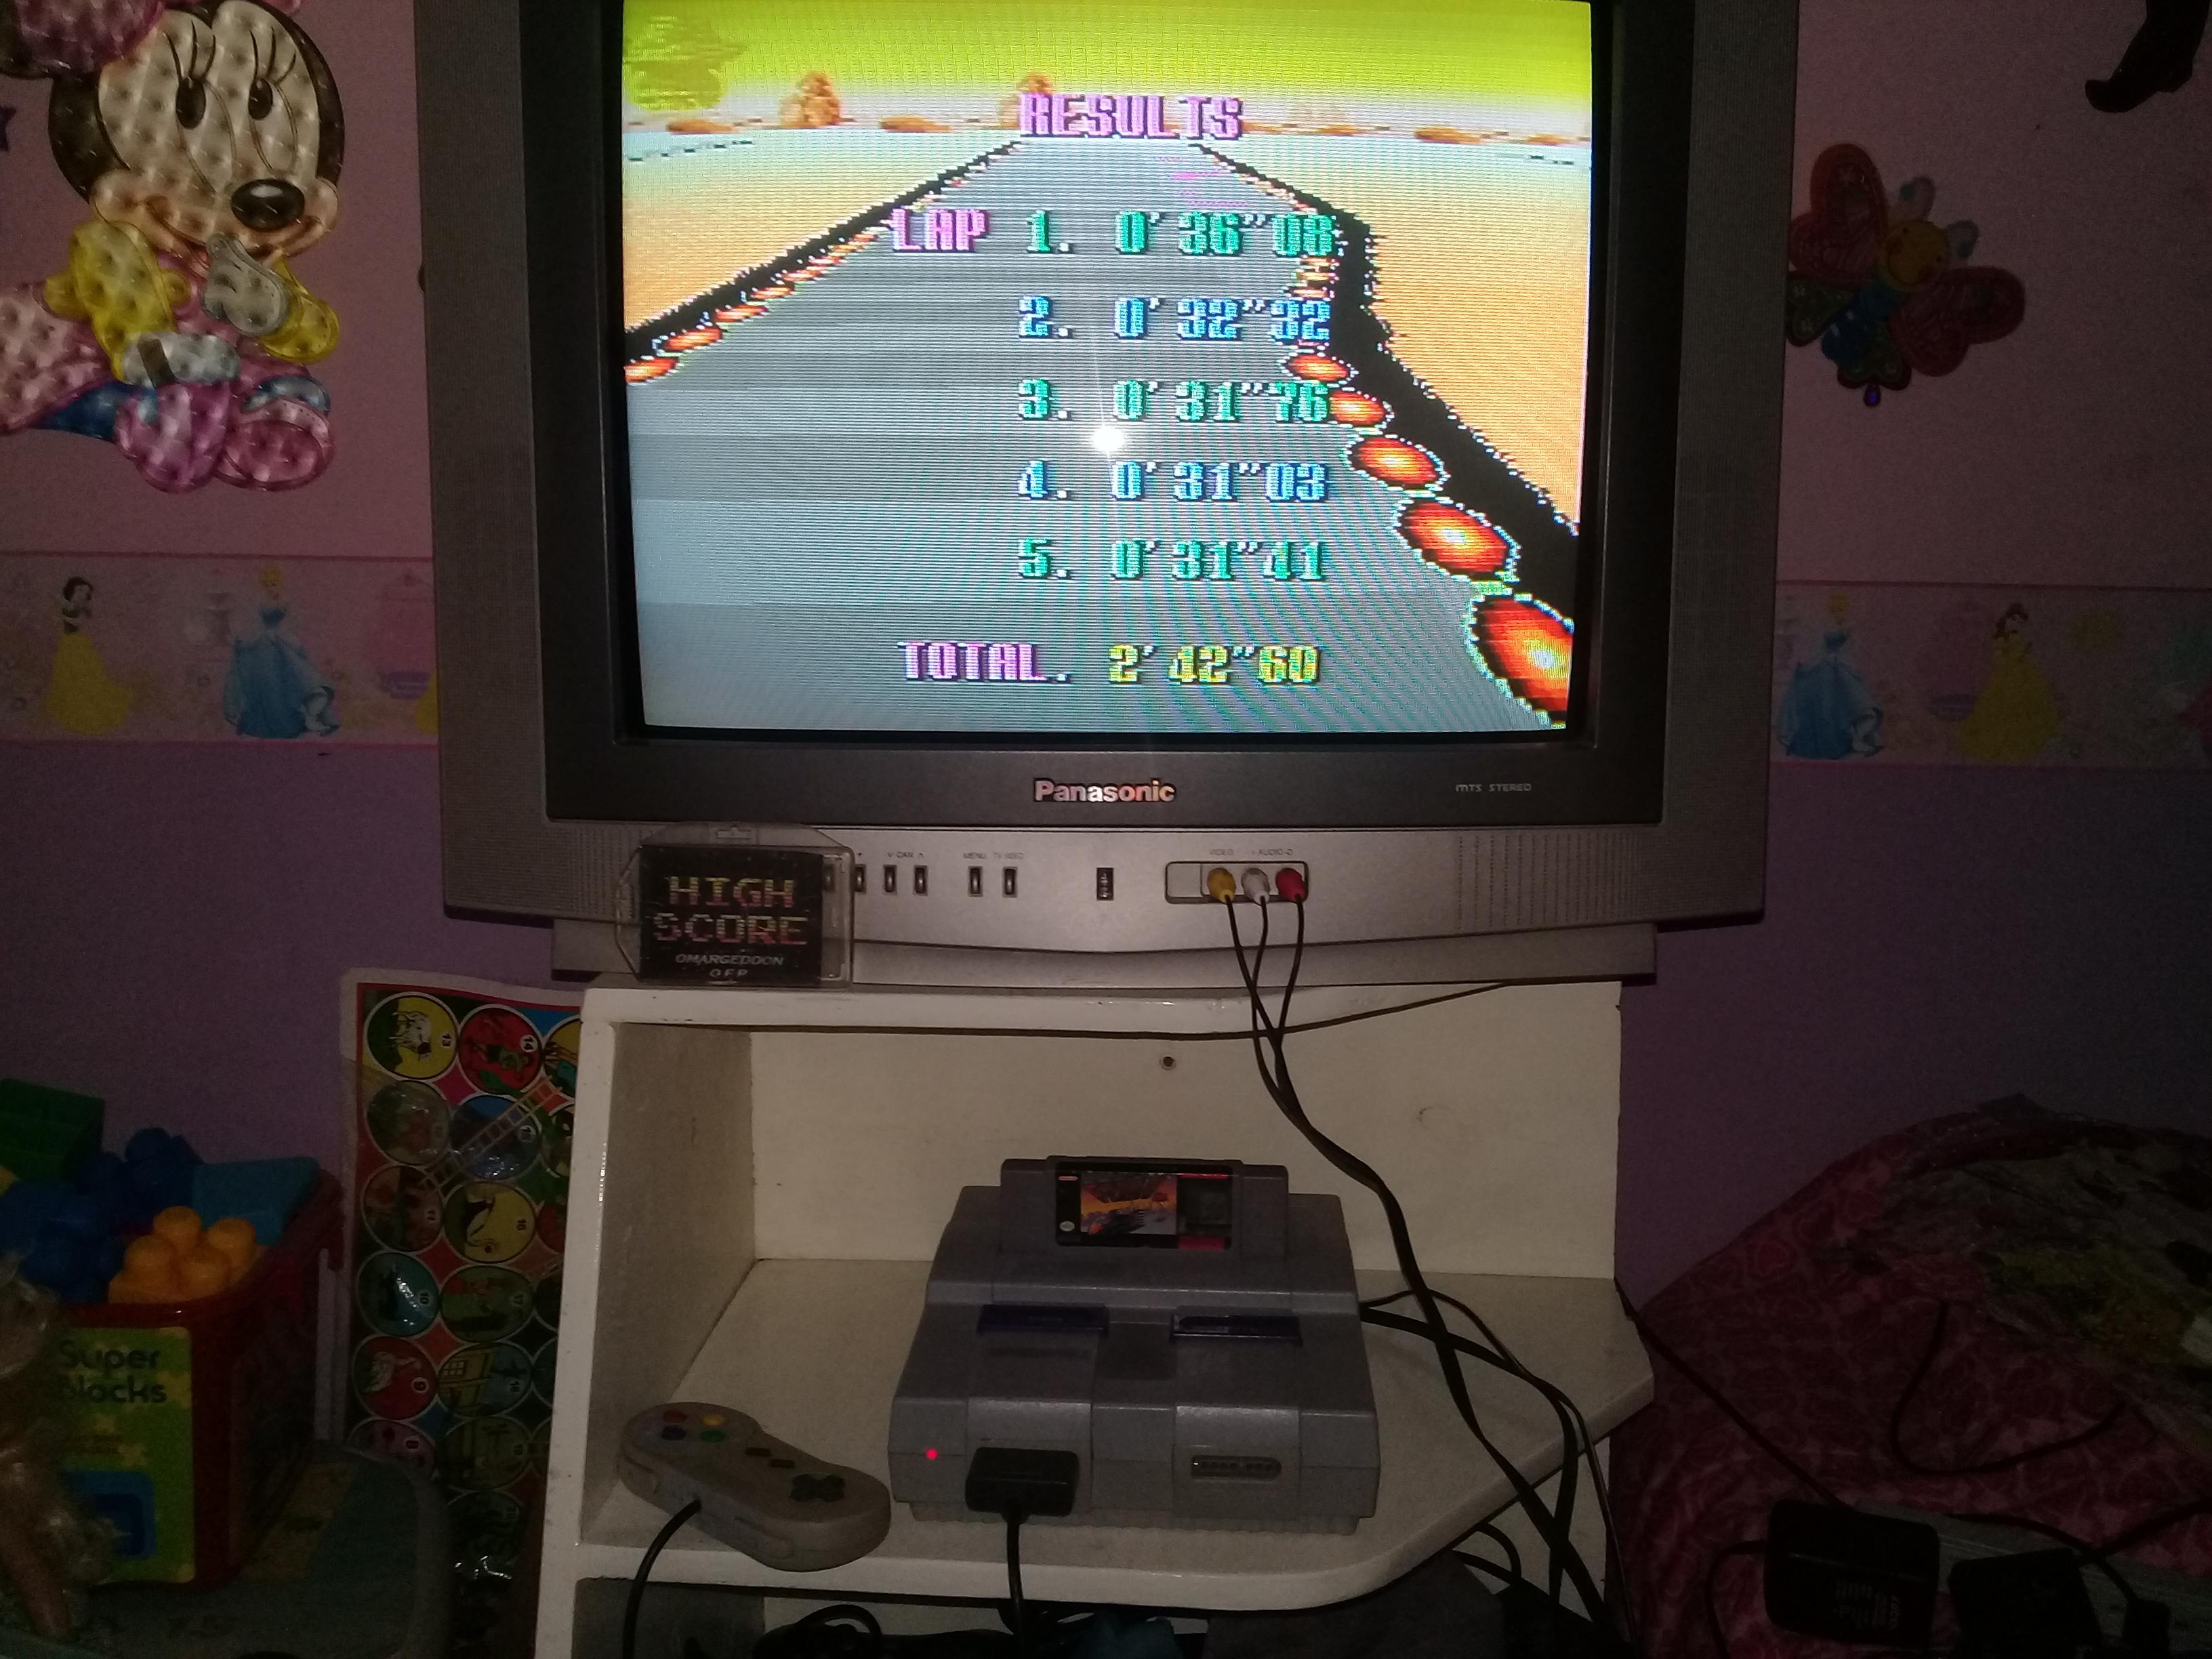 omargeddon: F-Zero: Practice [No Rival]: Sand Ocean (SNES/Super Famicom) 0:02:42.6 points on 2019-06-14 12:48:48